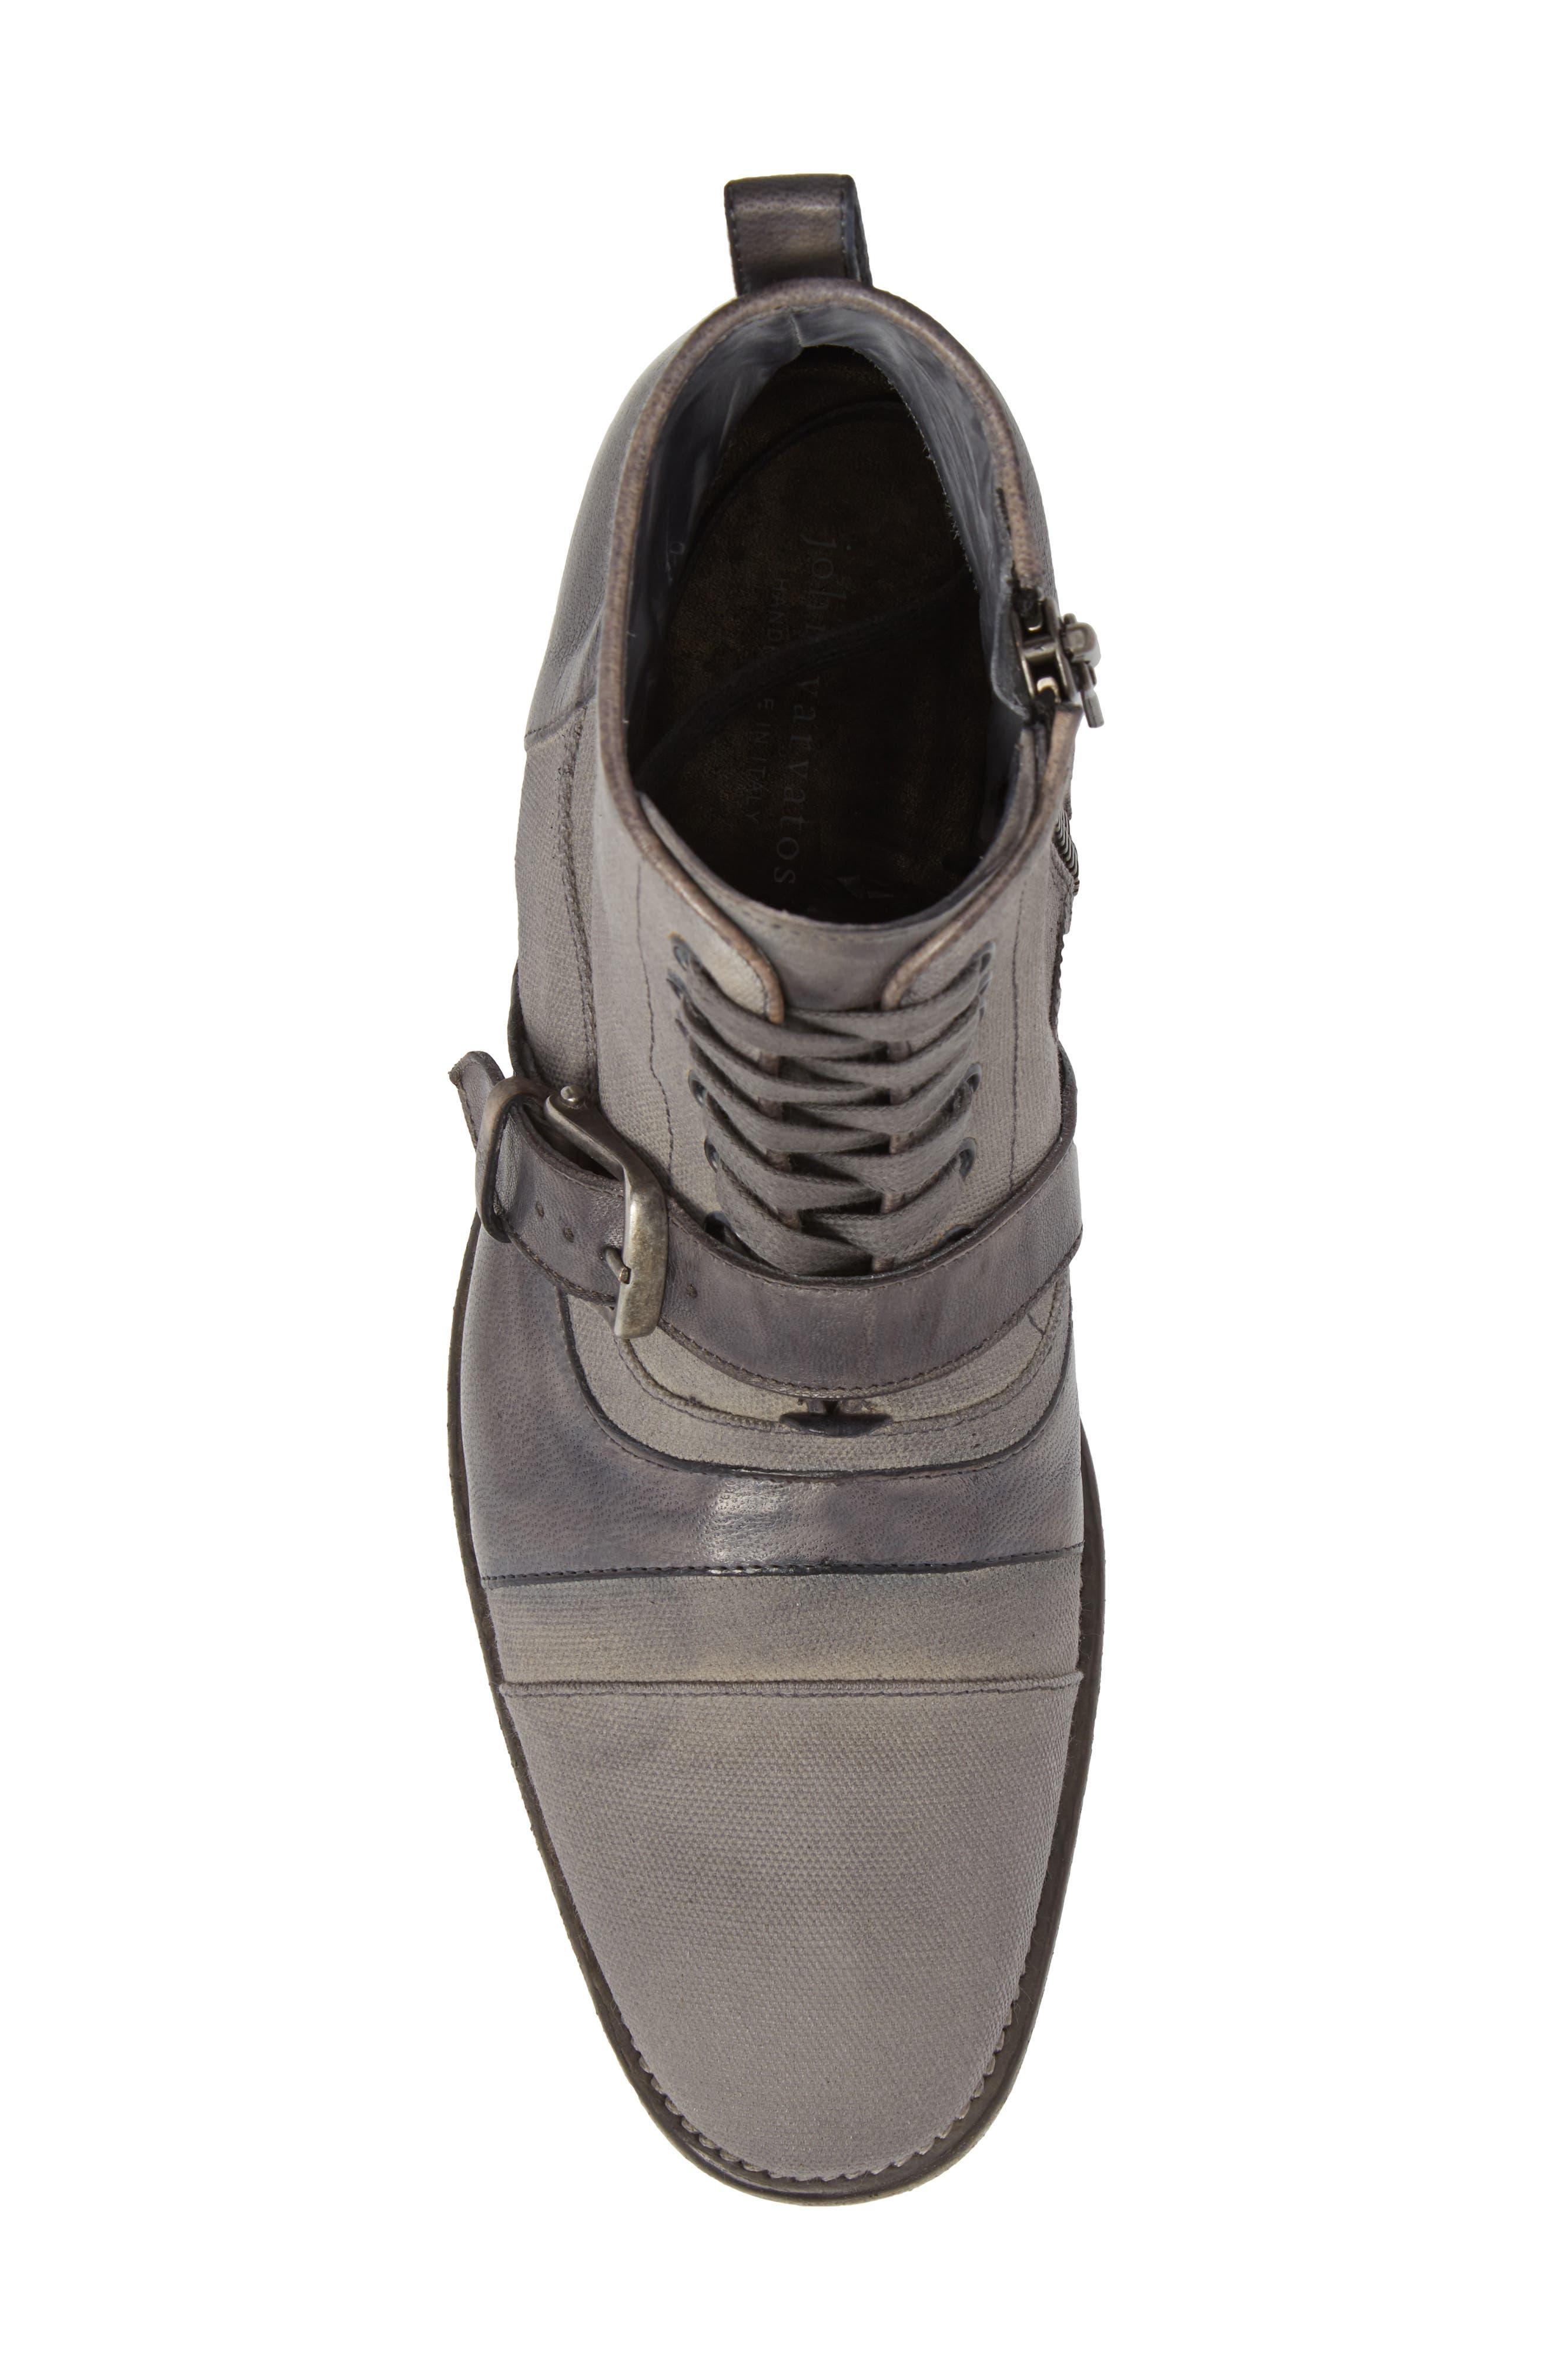 John Varvatos Fleetwood Buckle Cricket Boot,                             Alternate thumbnail 5, color,                             Lead Canvas/ Leather